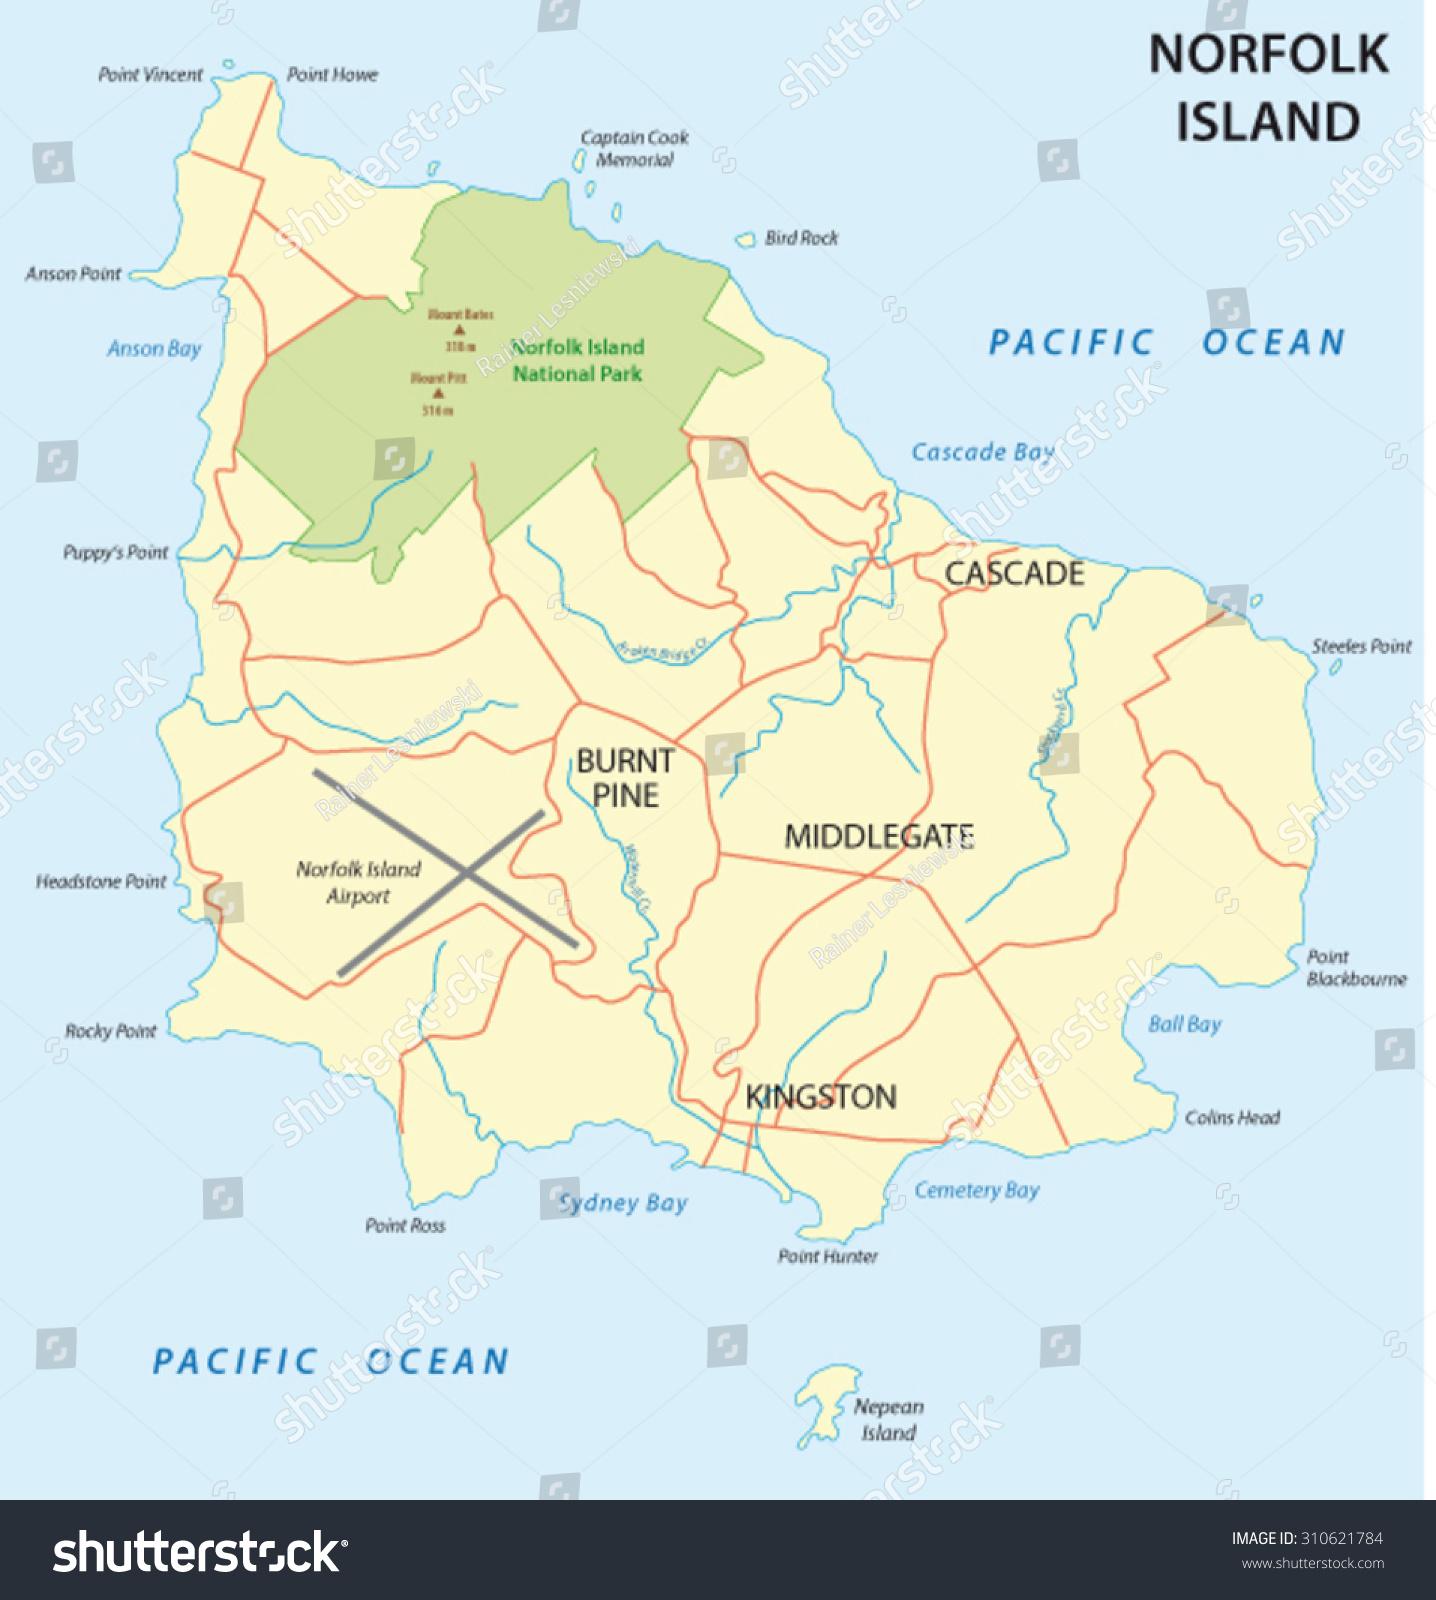 Norfolk Island Map Stock Vector Shutterstock - Norfolk island map